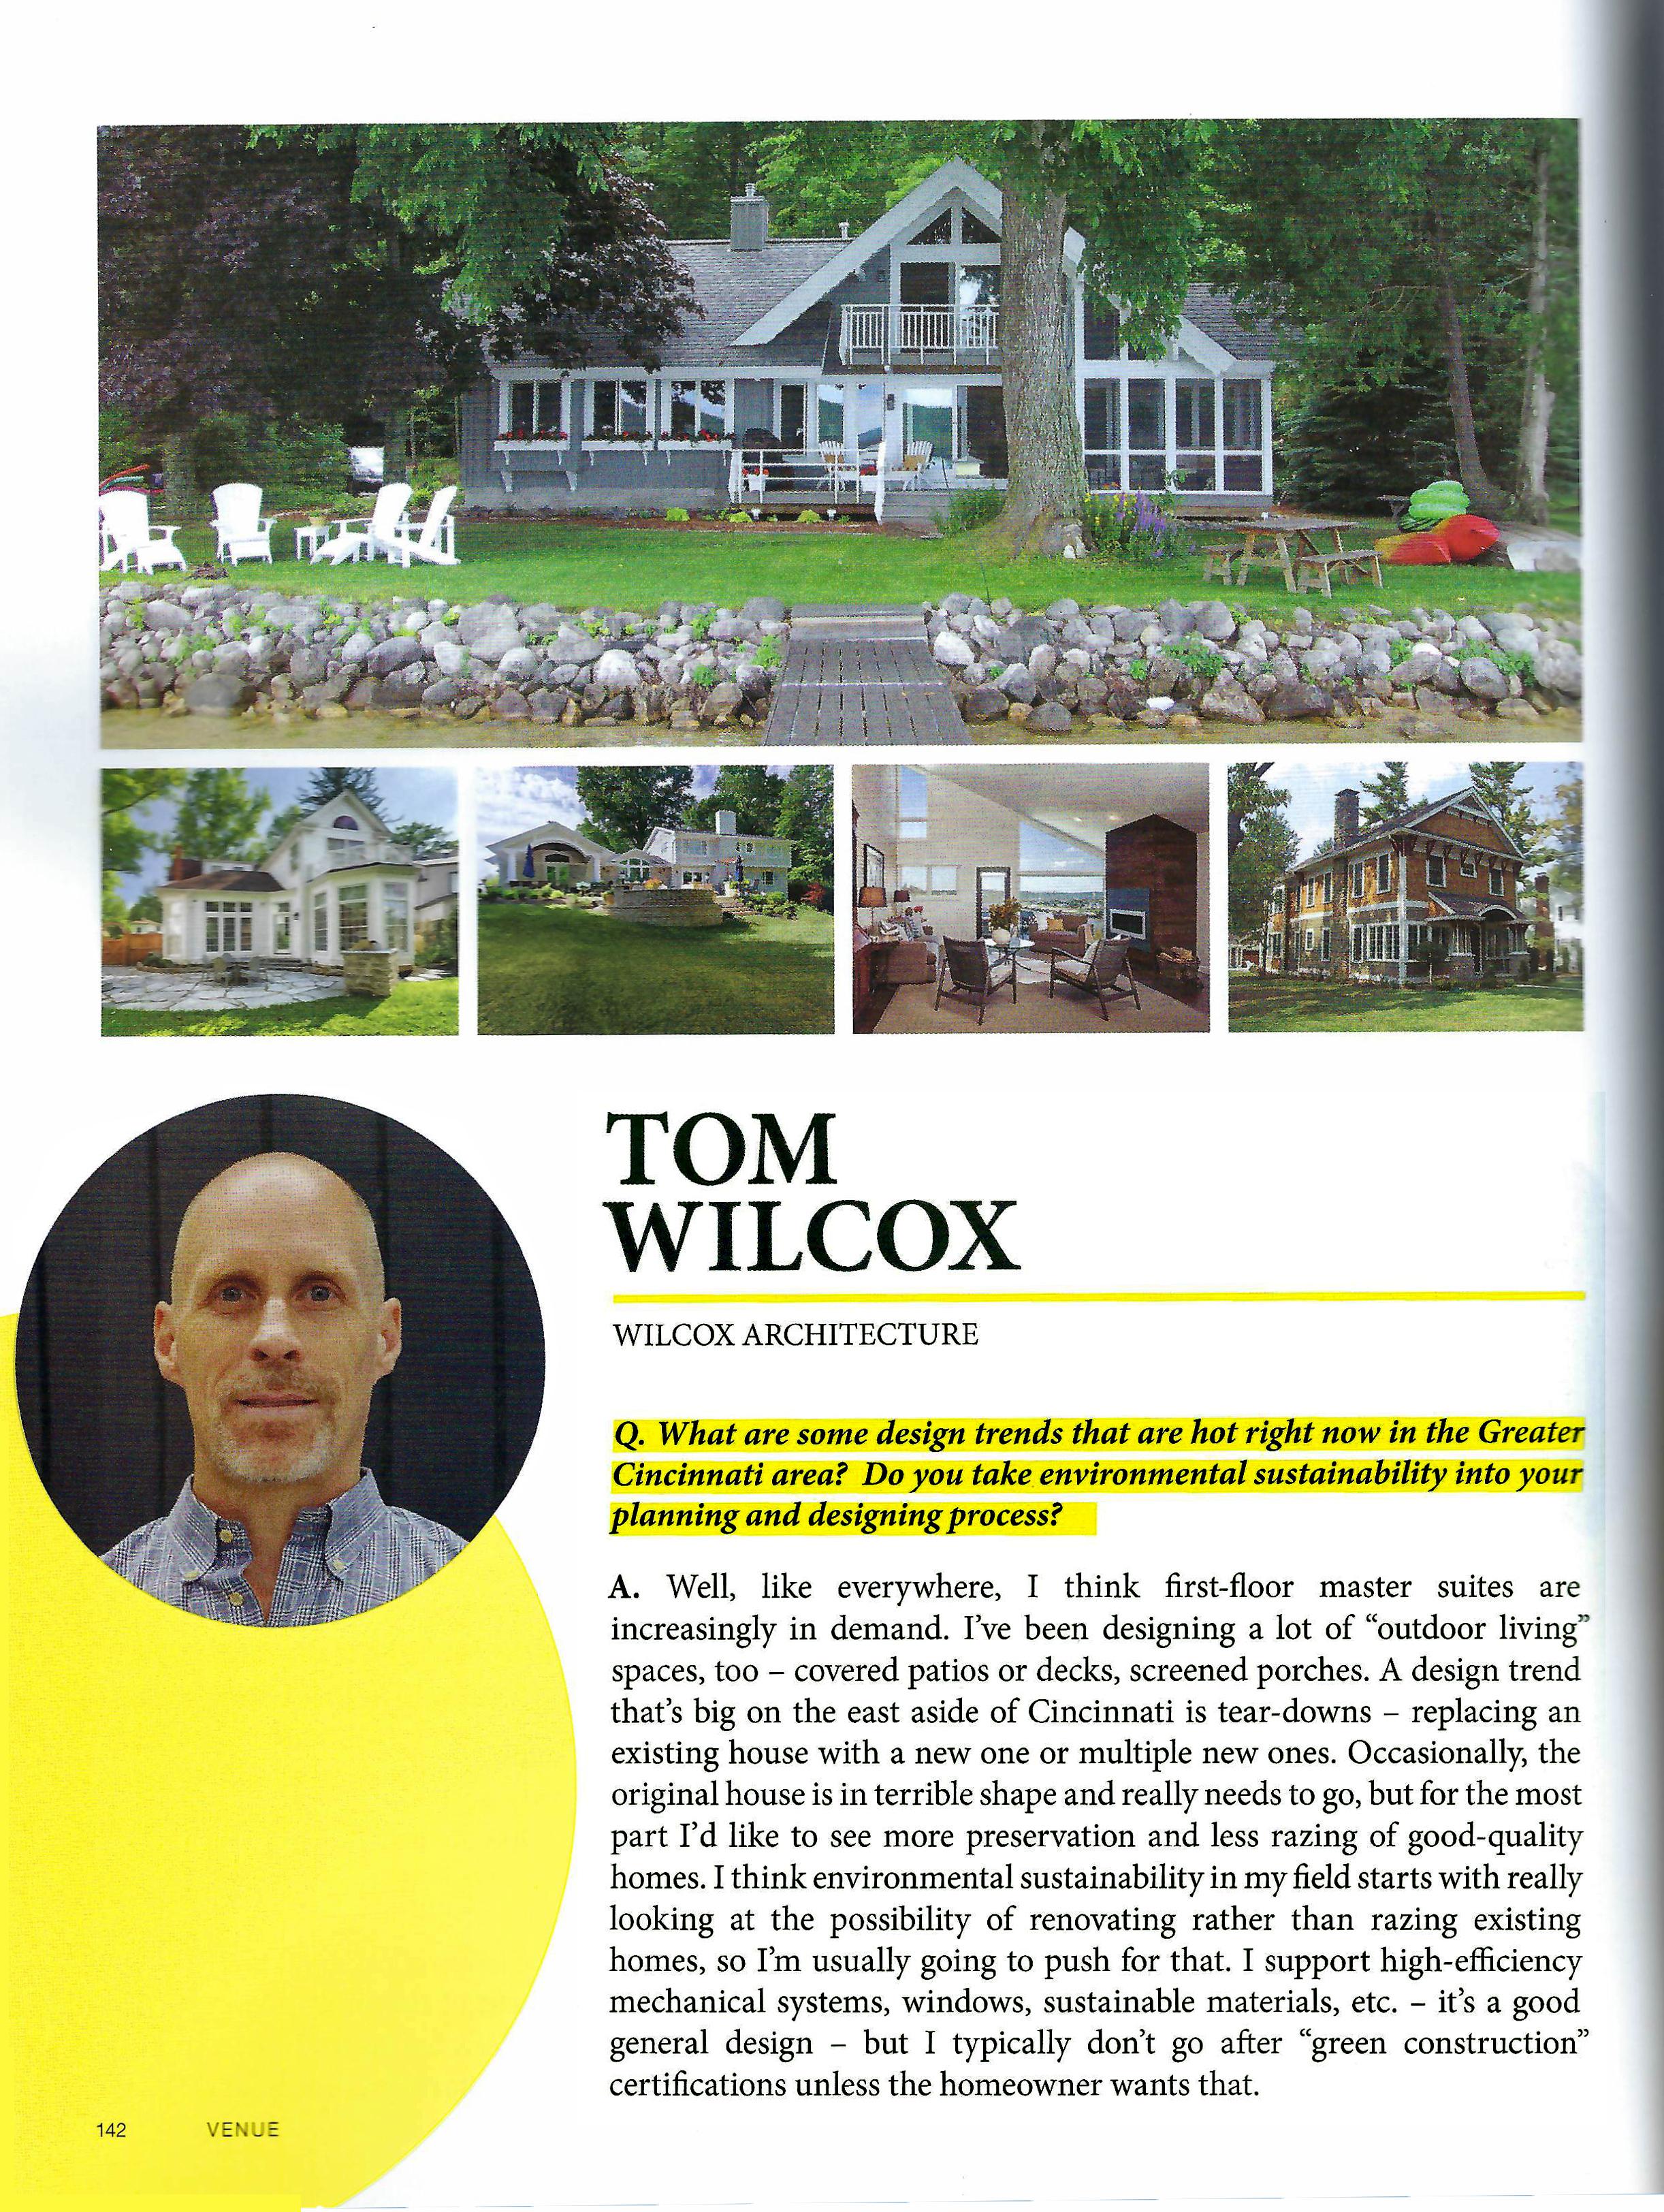 Magazine article Leading Influencers in Architecture & Design in Greater Cincinnati Wilcox Architecture